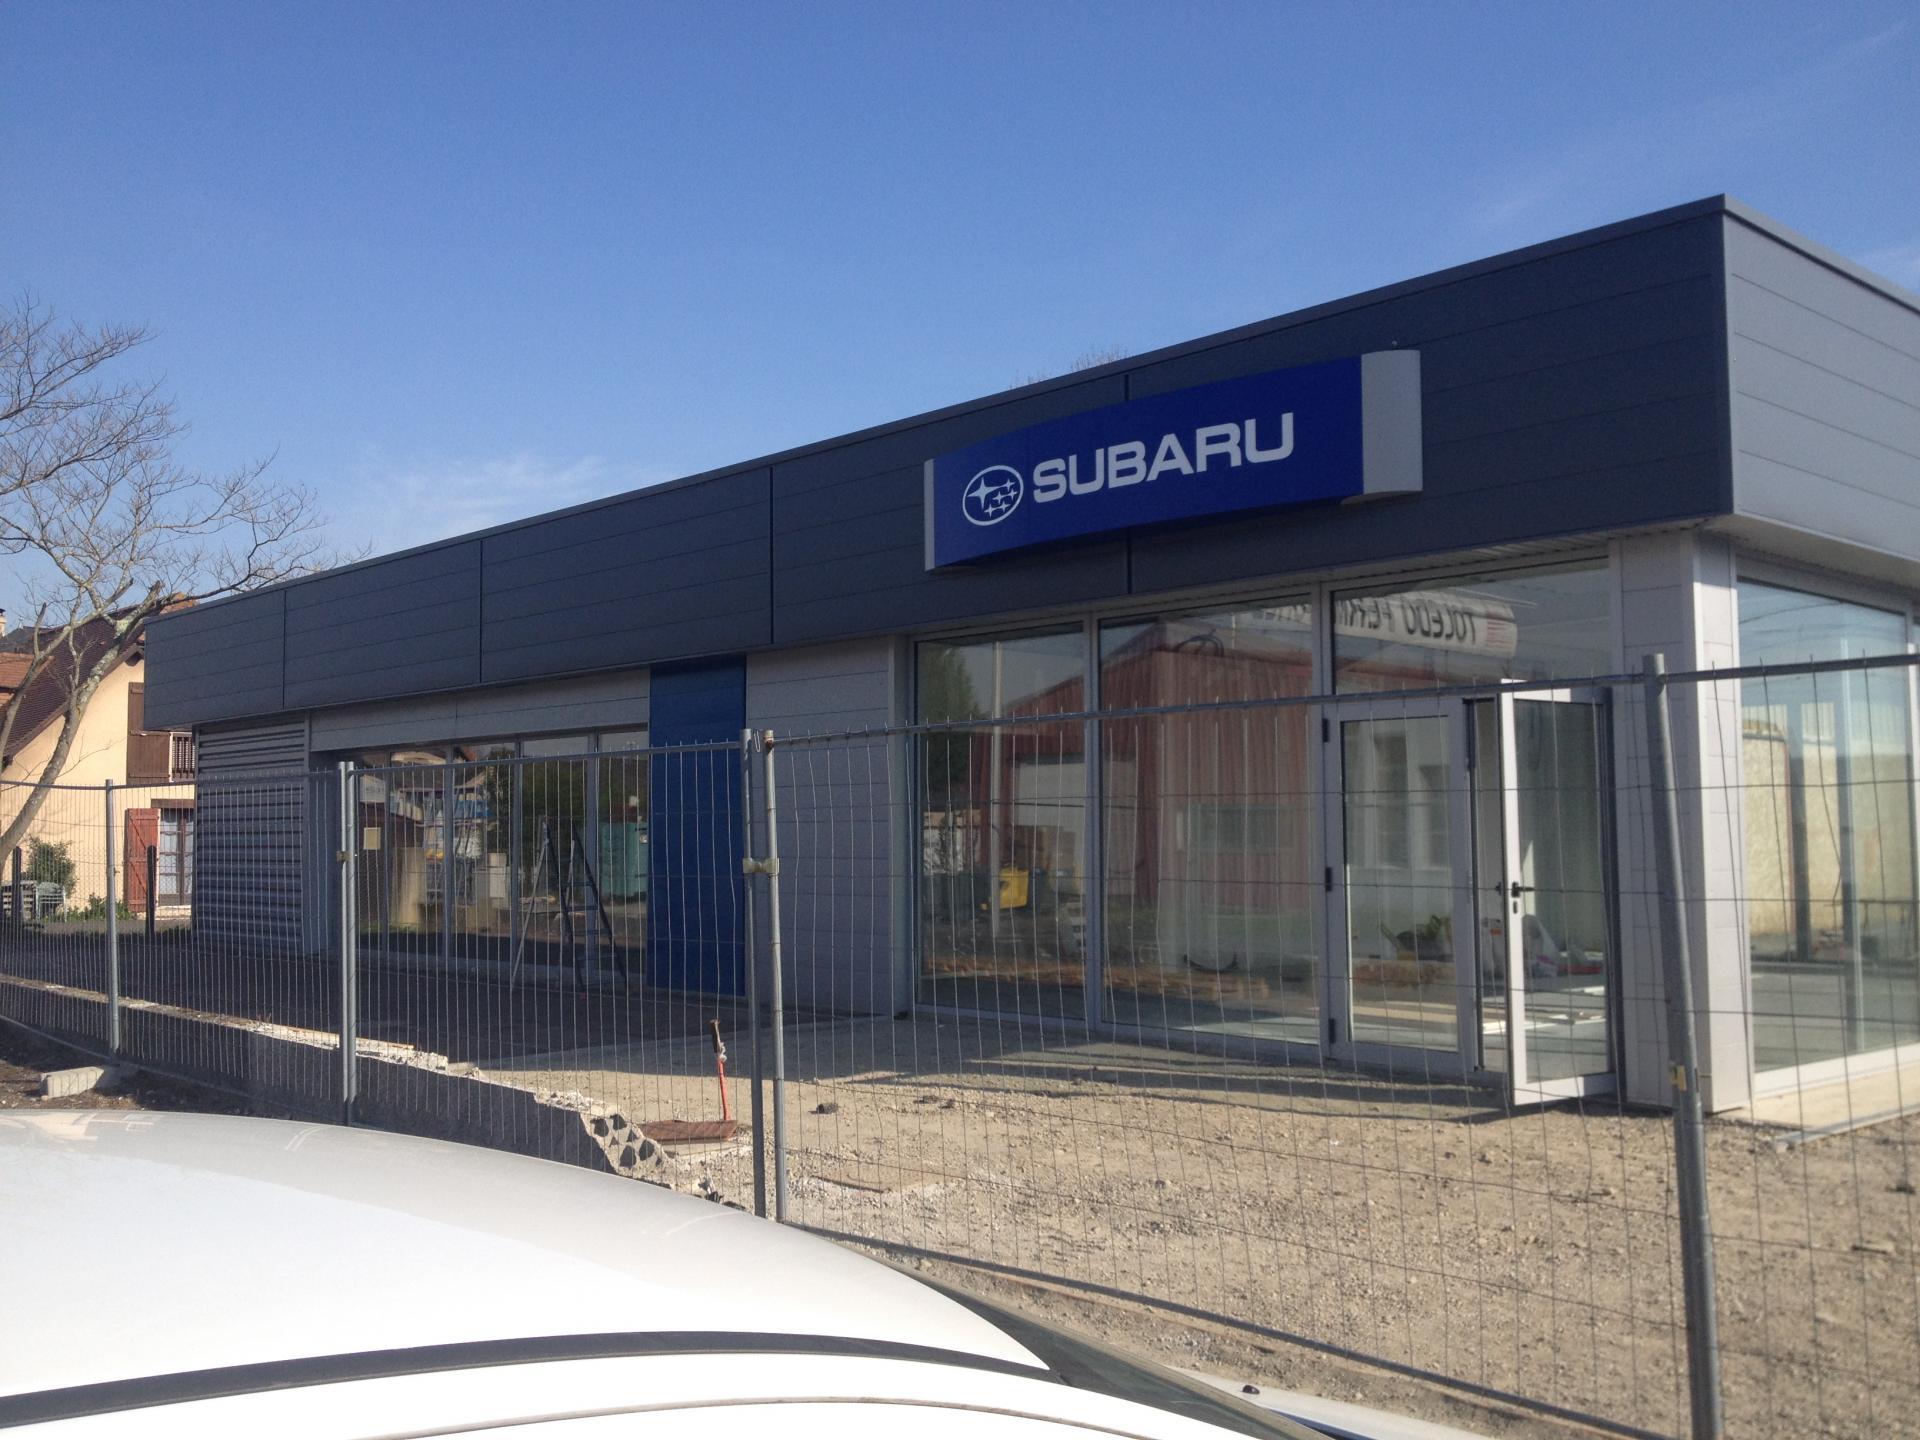 Garage Subaru à Lescar